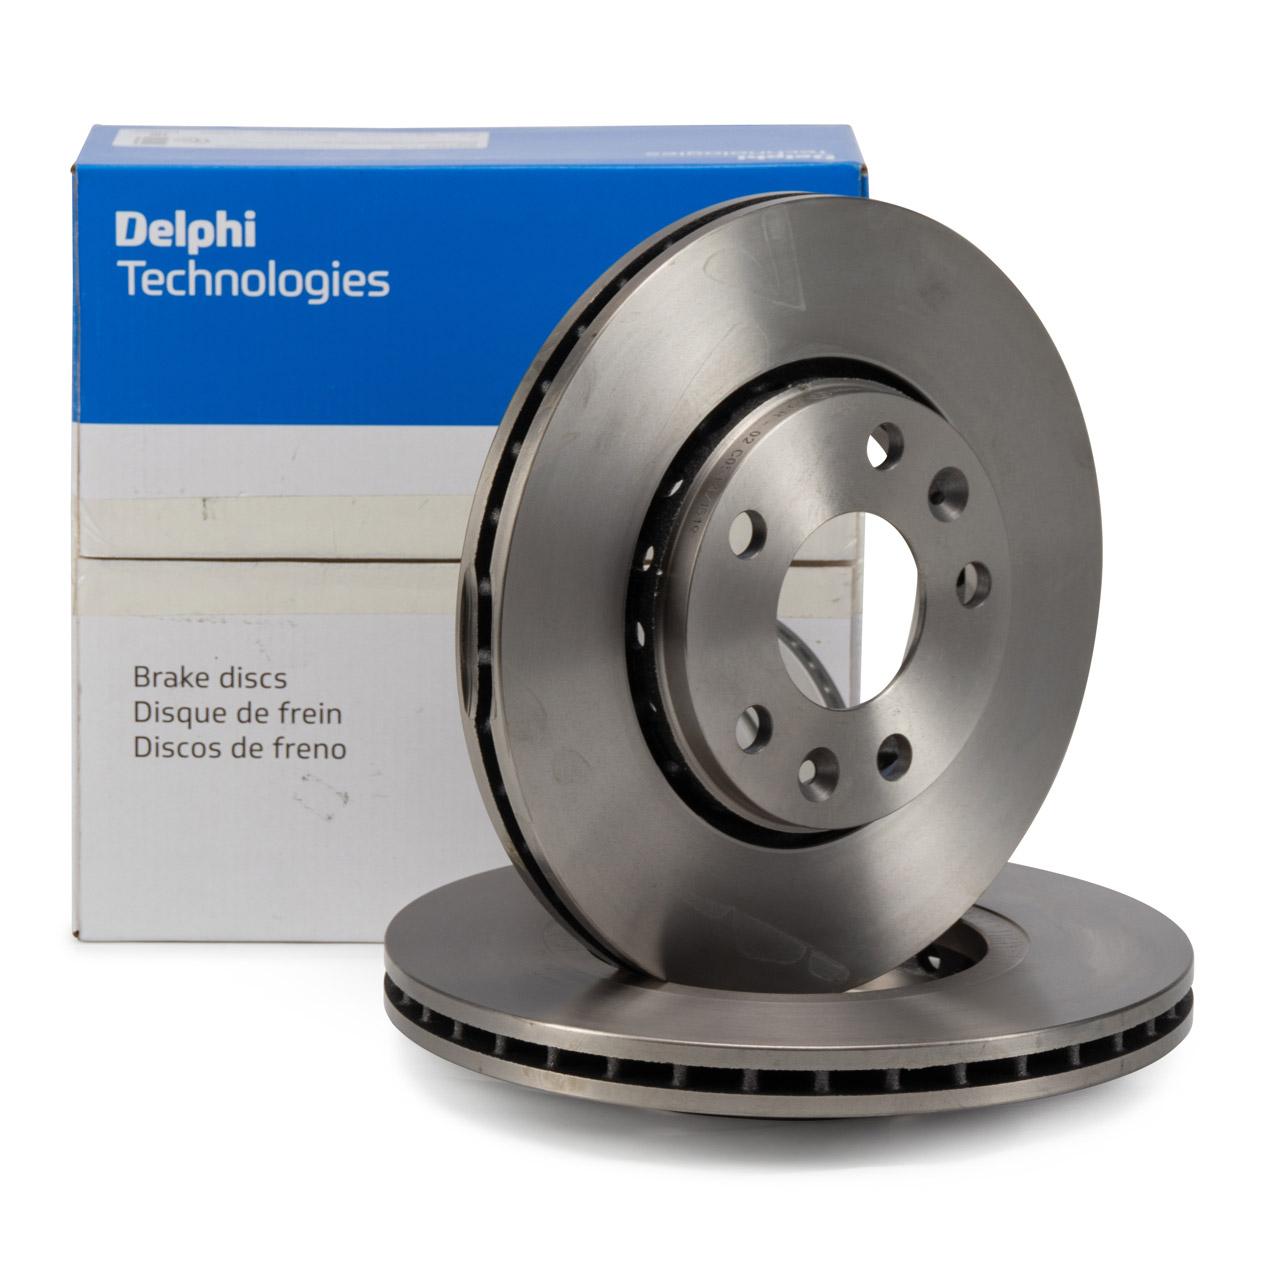 Bremsscheibe belüftet Ø280mm vorne Dacia Duster Renault Laguna Megane 3